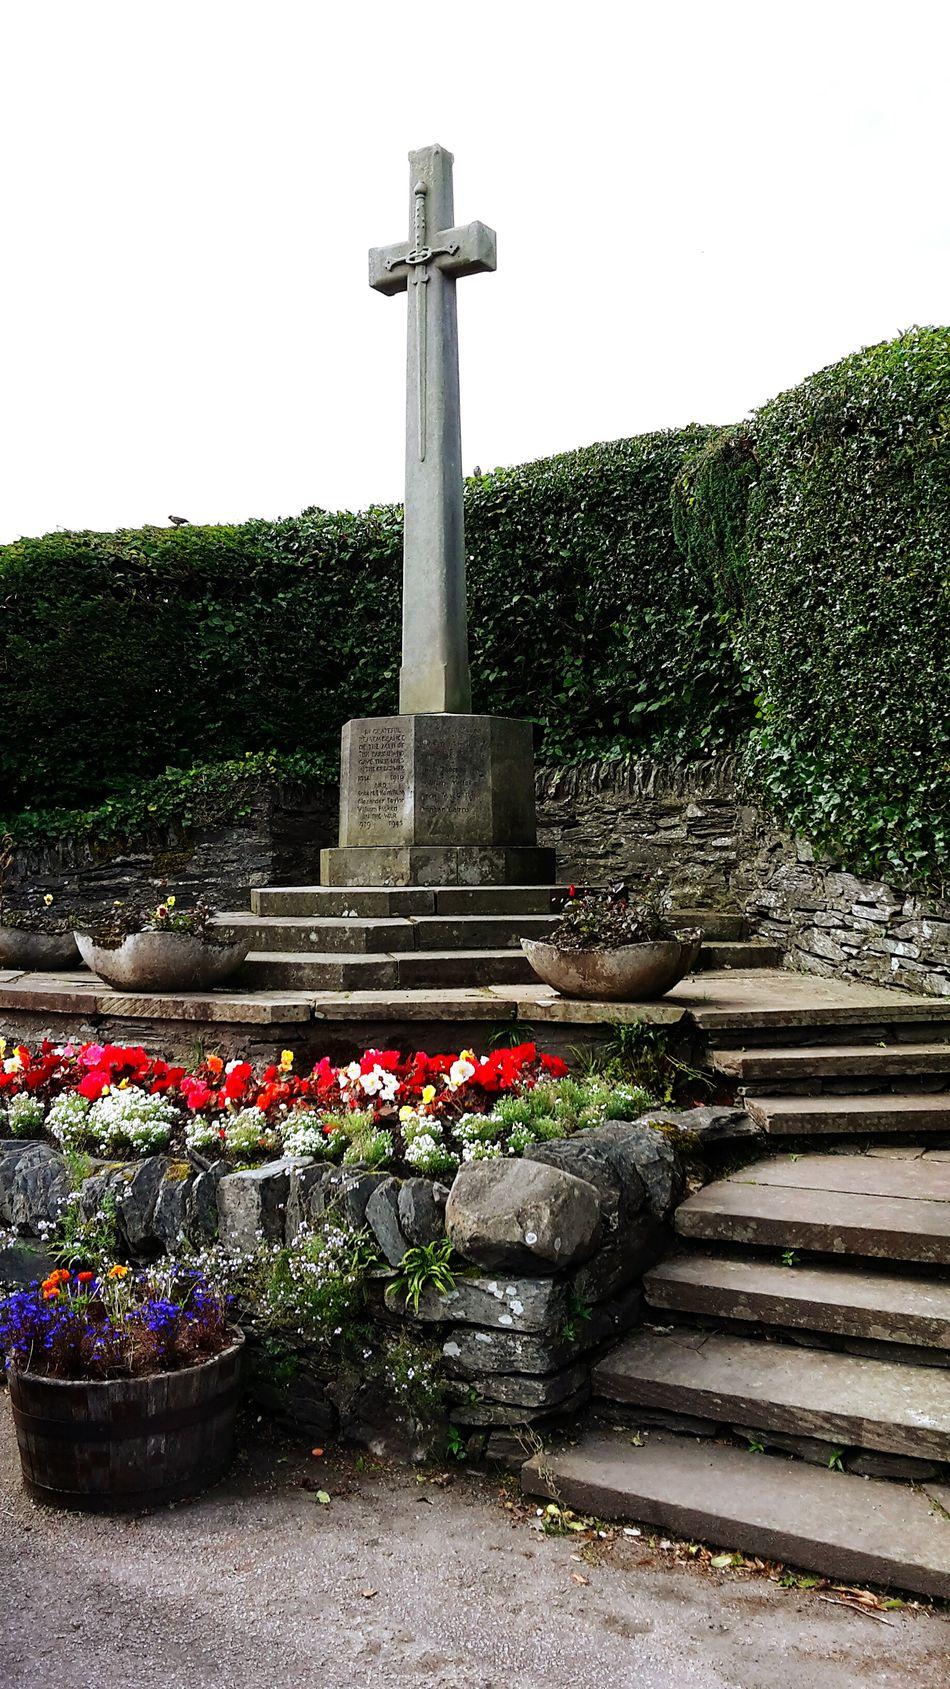 Scotland Loch Lomond Flower Cross Sword Decoration Outdoors Architectural Column Stone Cross